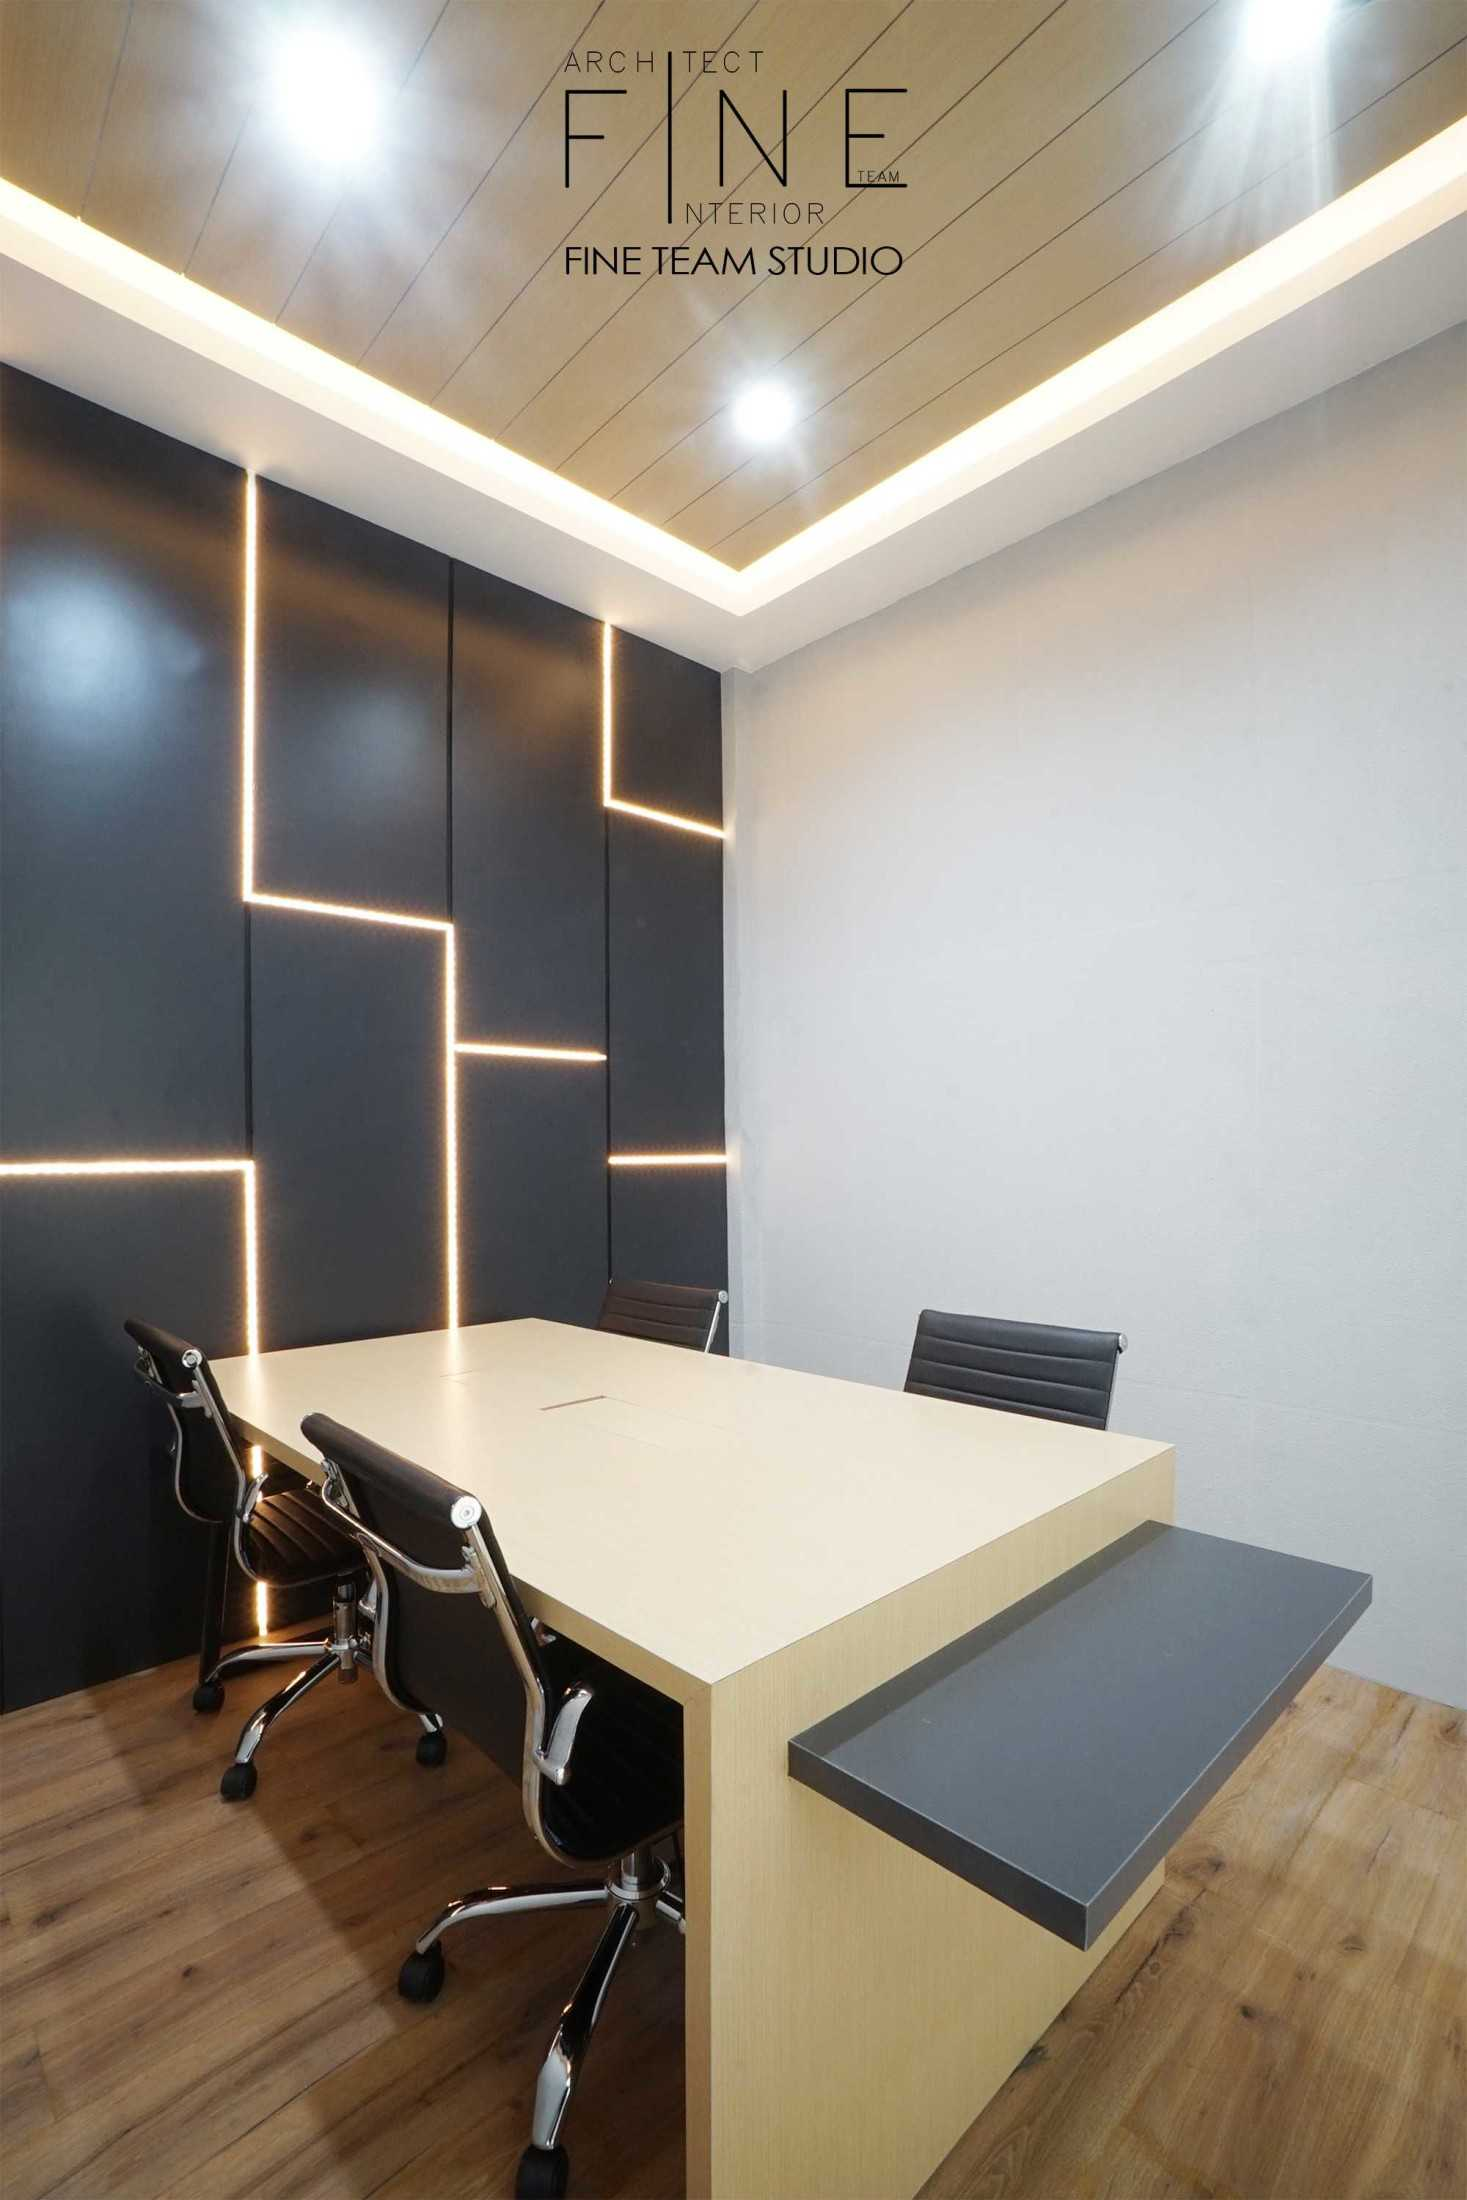 Fine Team Studio Mob Office Cikupa, Tangerang, Banten, Indonesia Cikupa, Tangerang, Banten, Indonesia Fine-Team-Studio-Mob-Office  71174